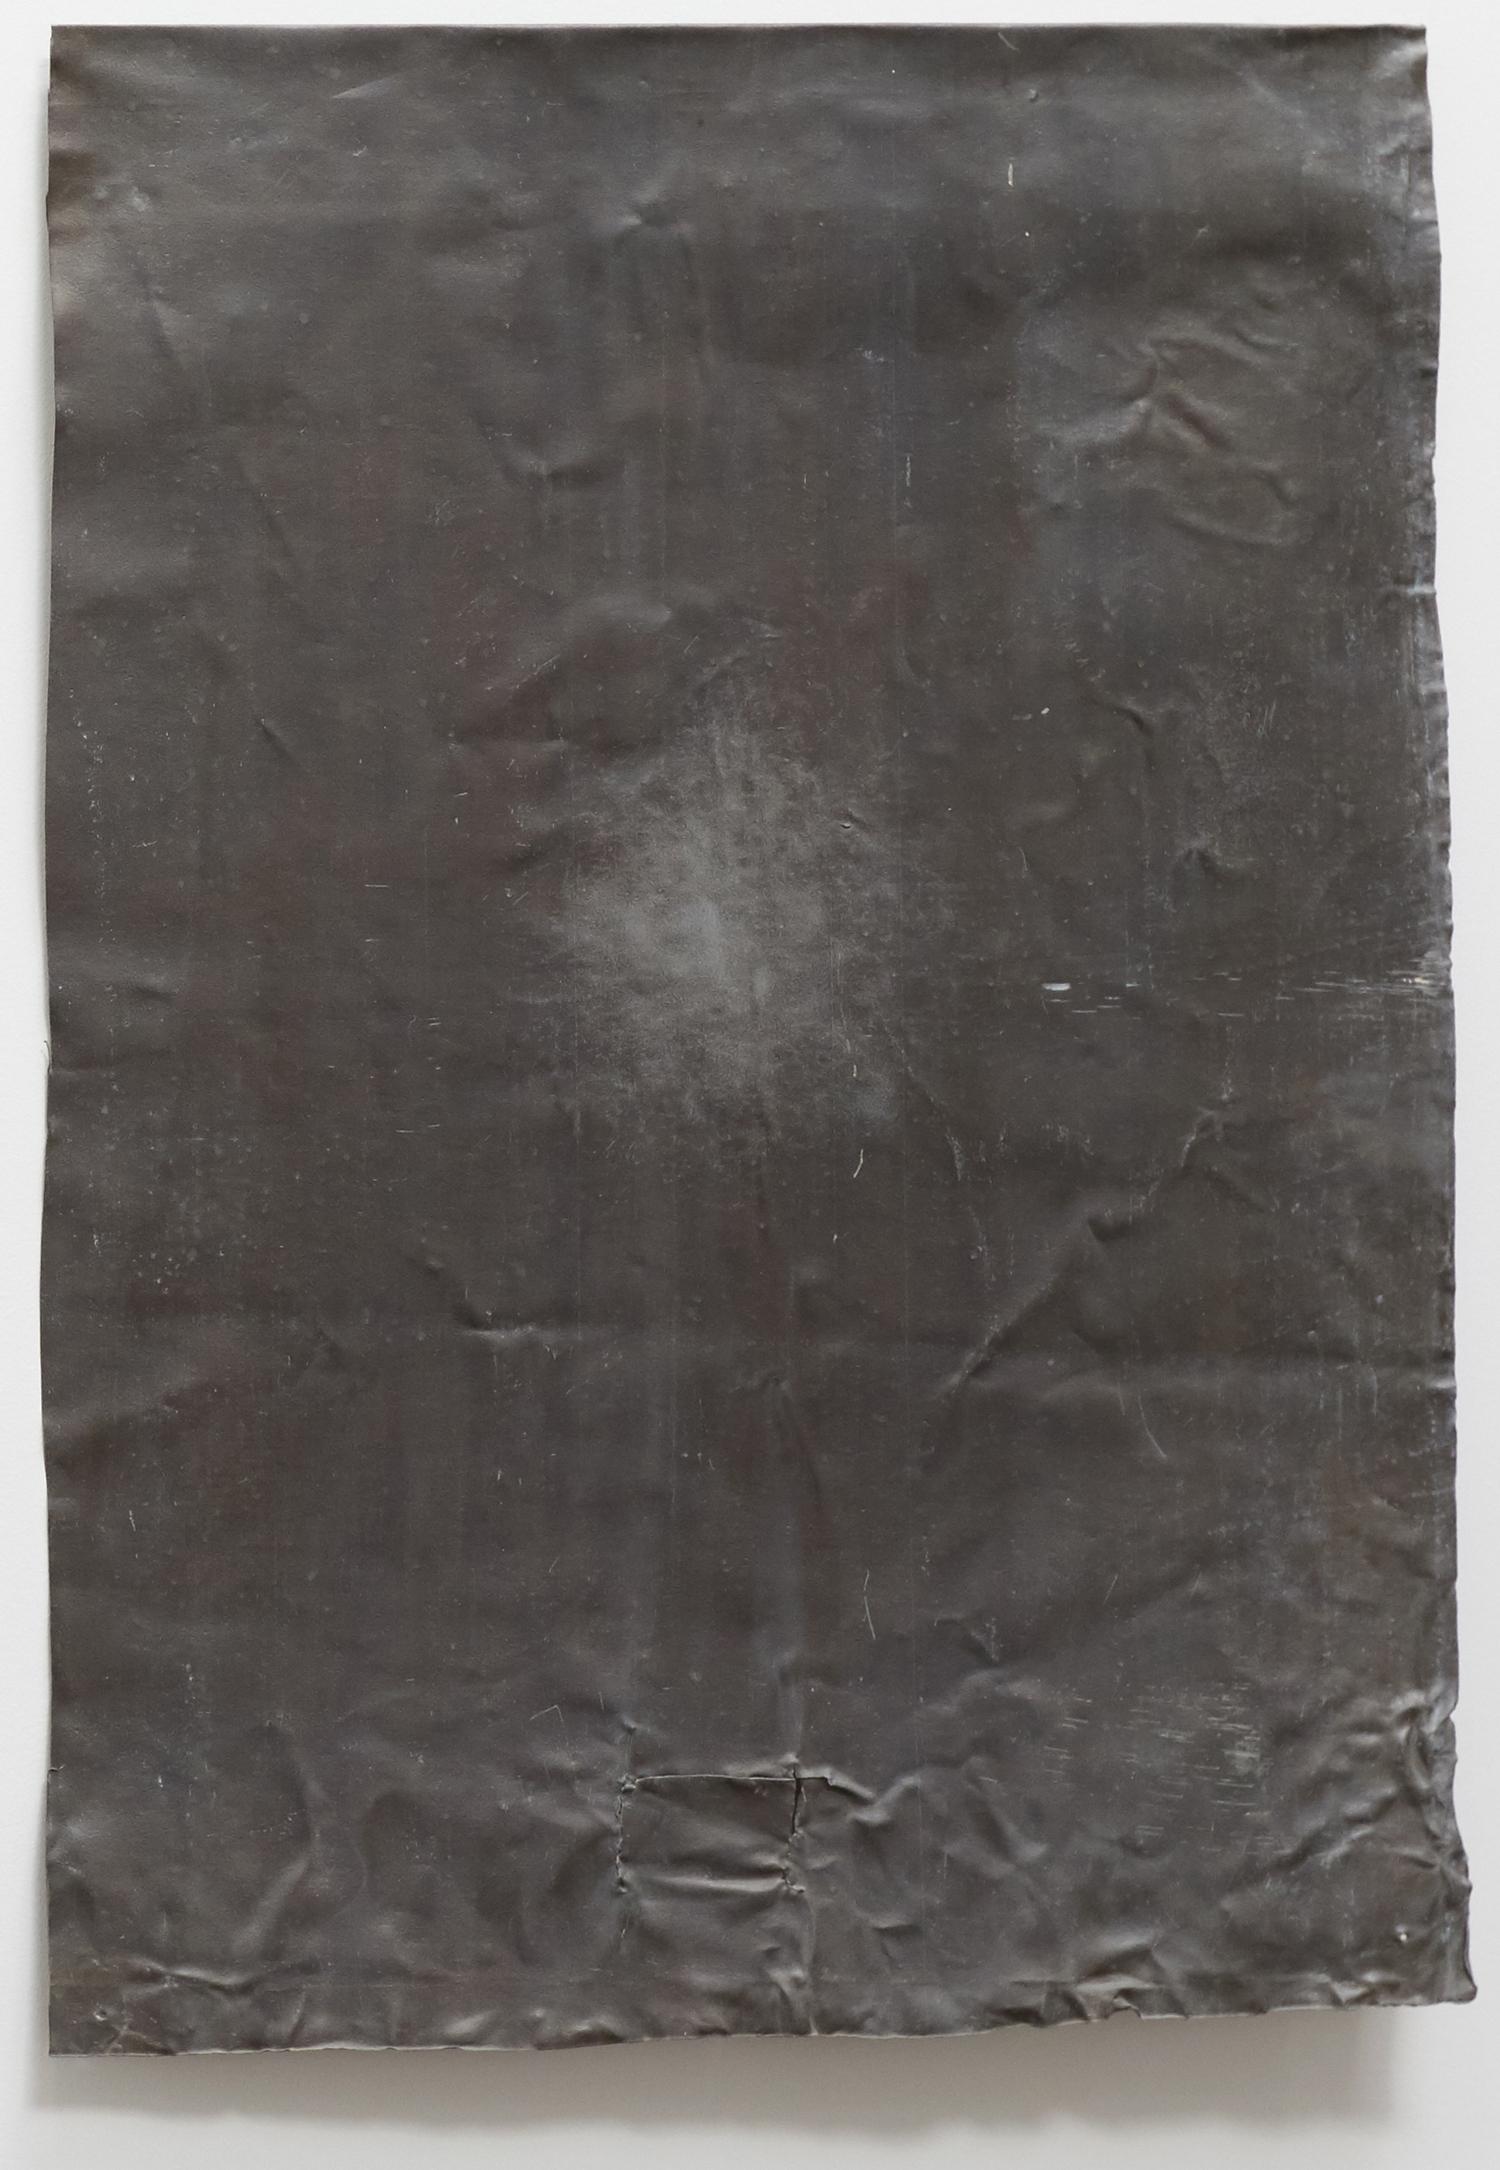 DAVID MERRITT  oxide drawing (1)  2016 lead 25.5 x 18 inches